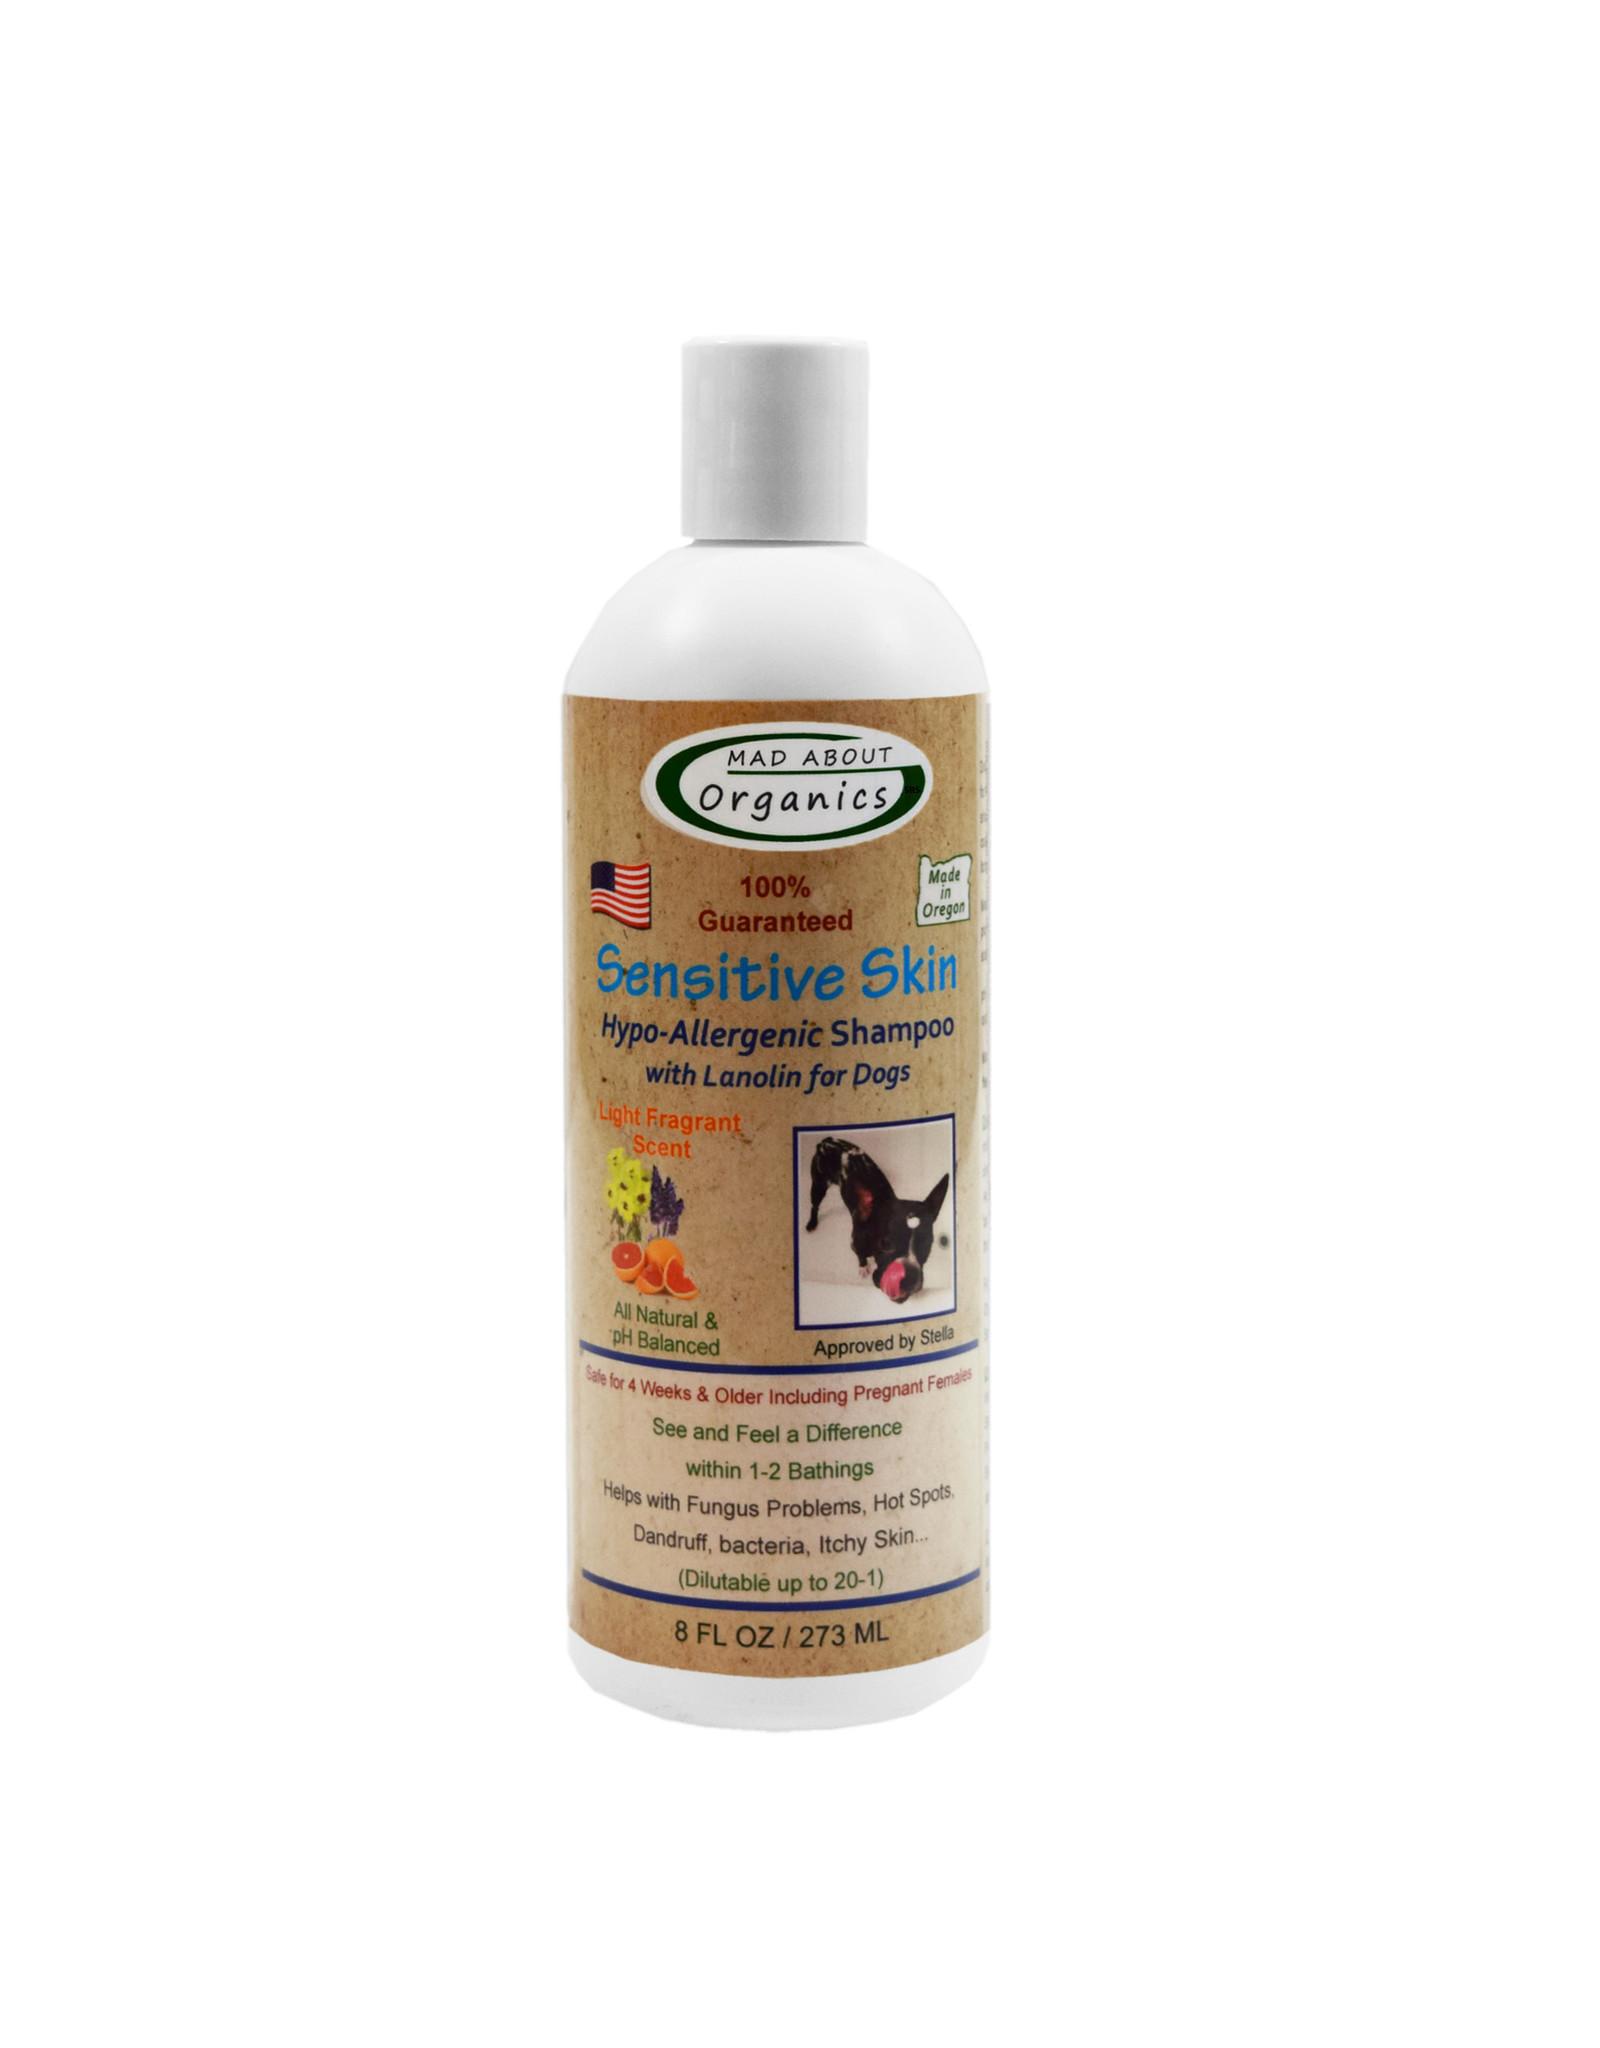 Mad About Organics Mad About Organics Sensitive Skin Shampoo 8oz